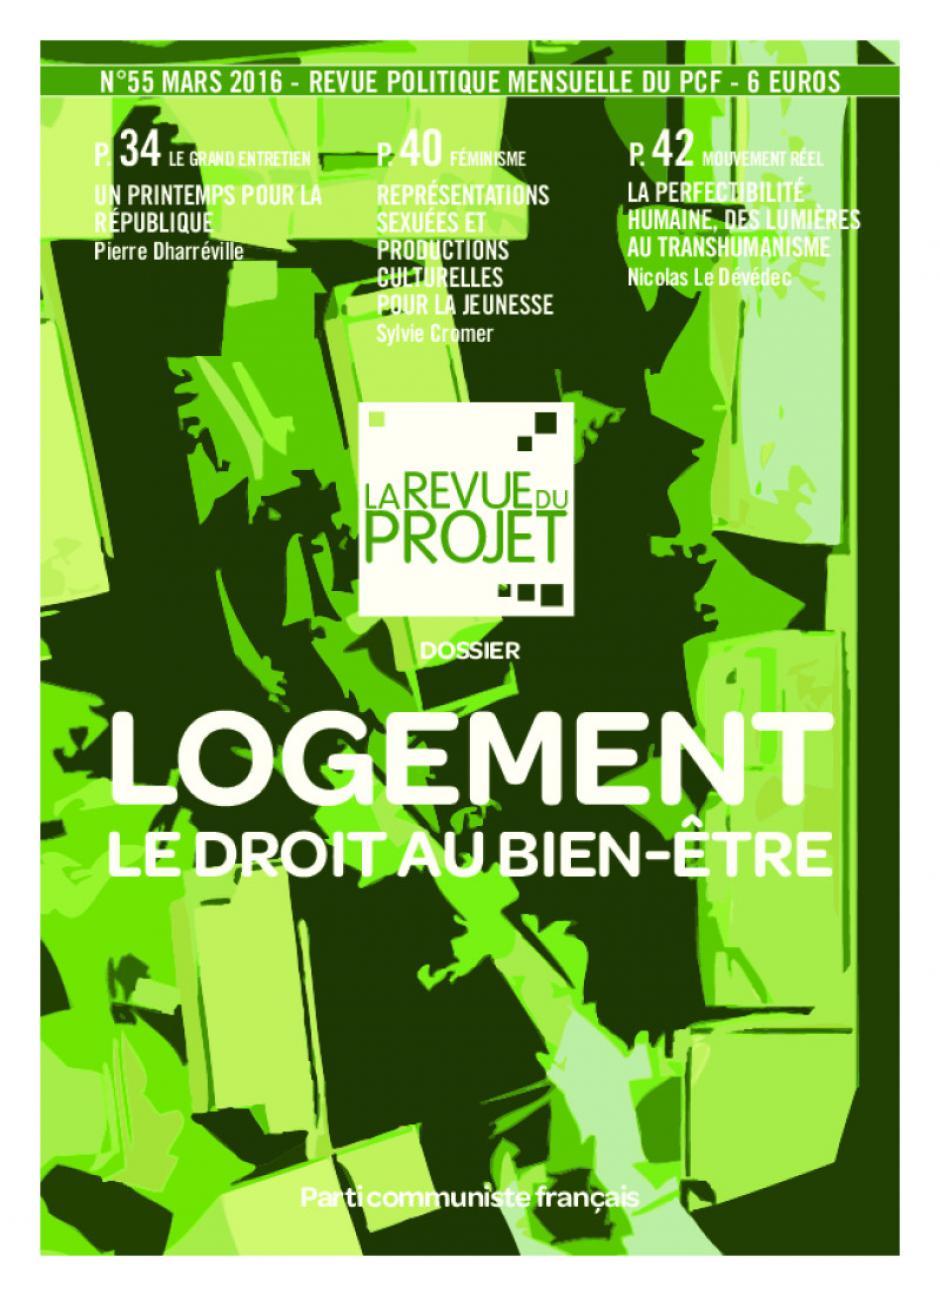 La Revue du projet, n° 55, mars 2016